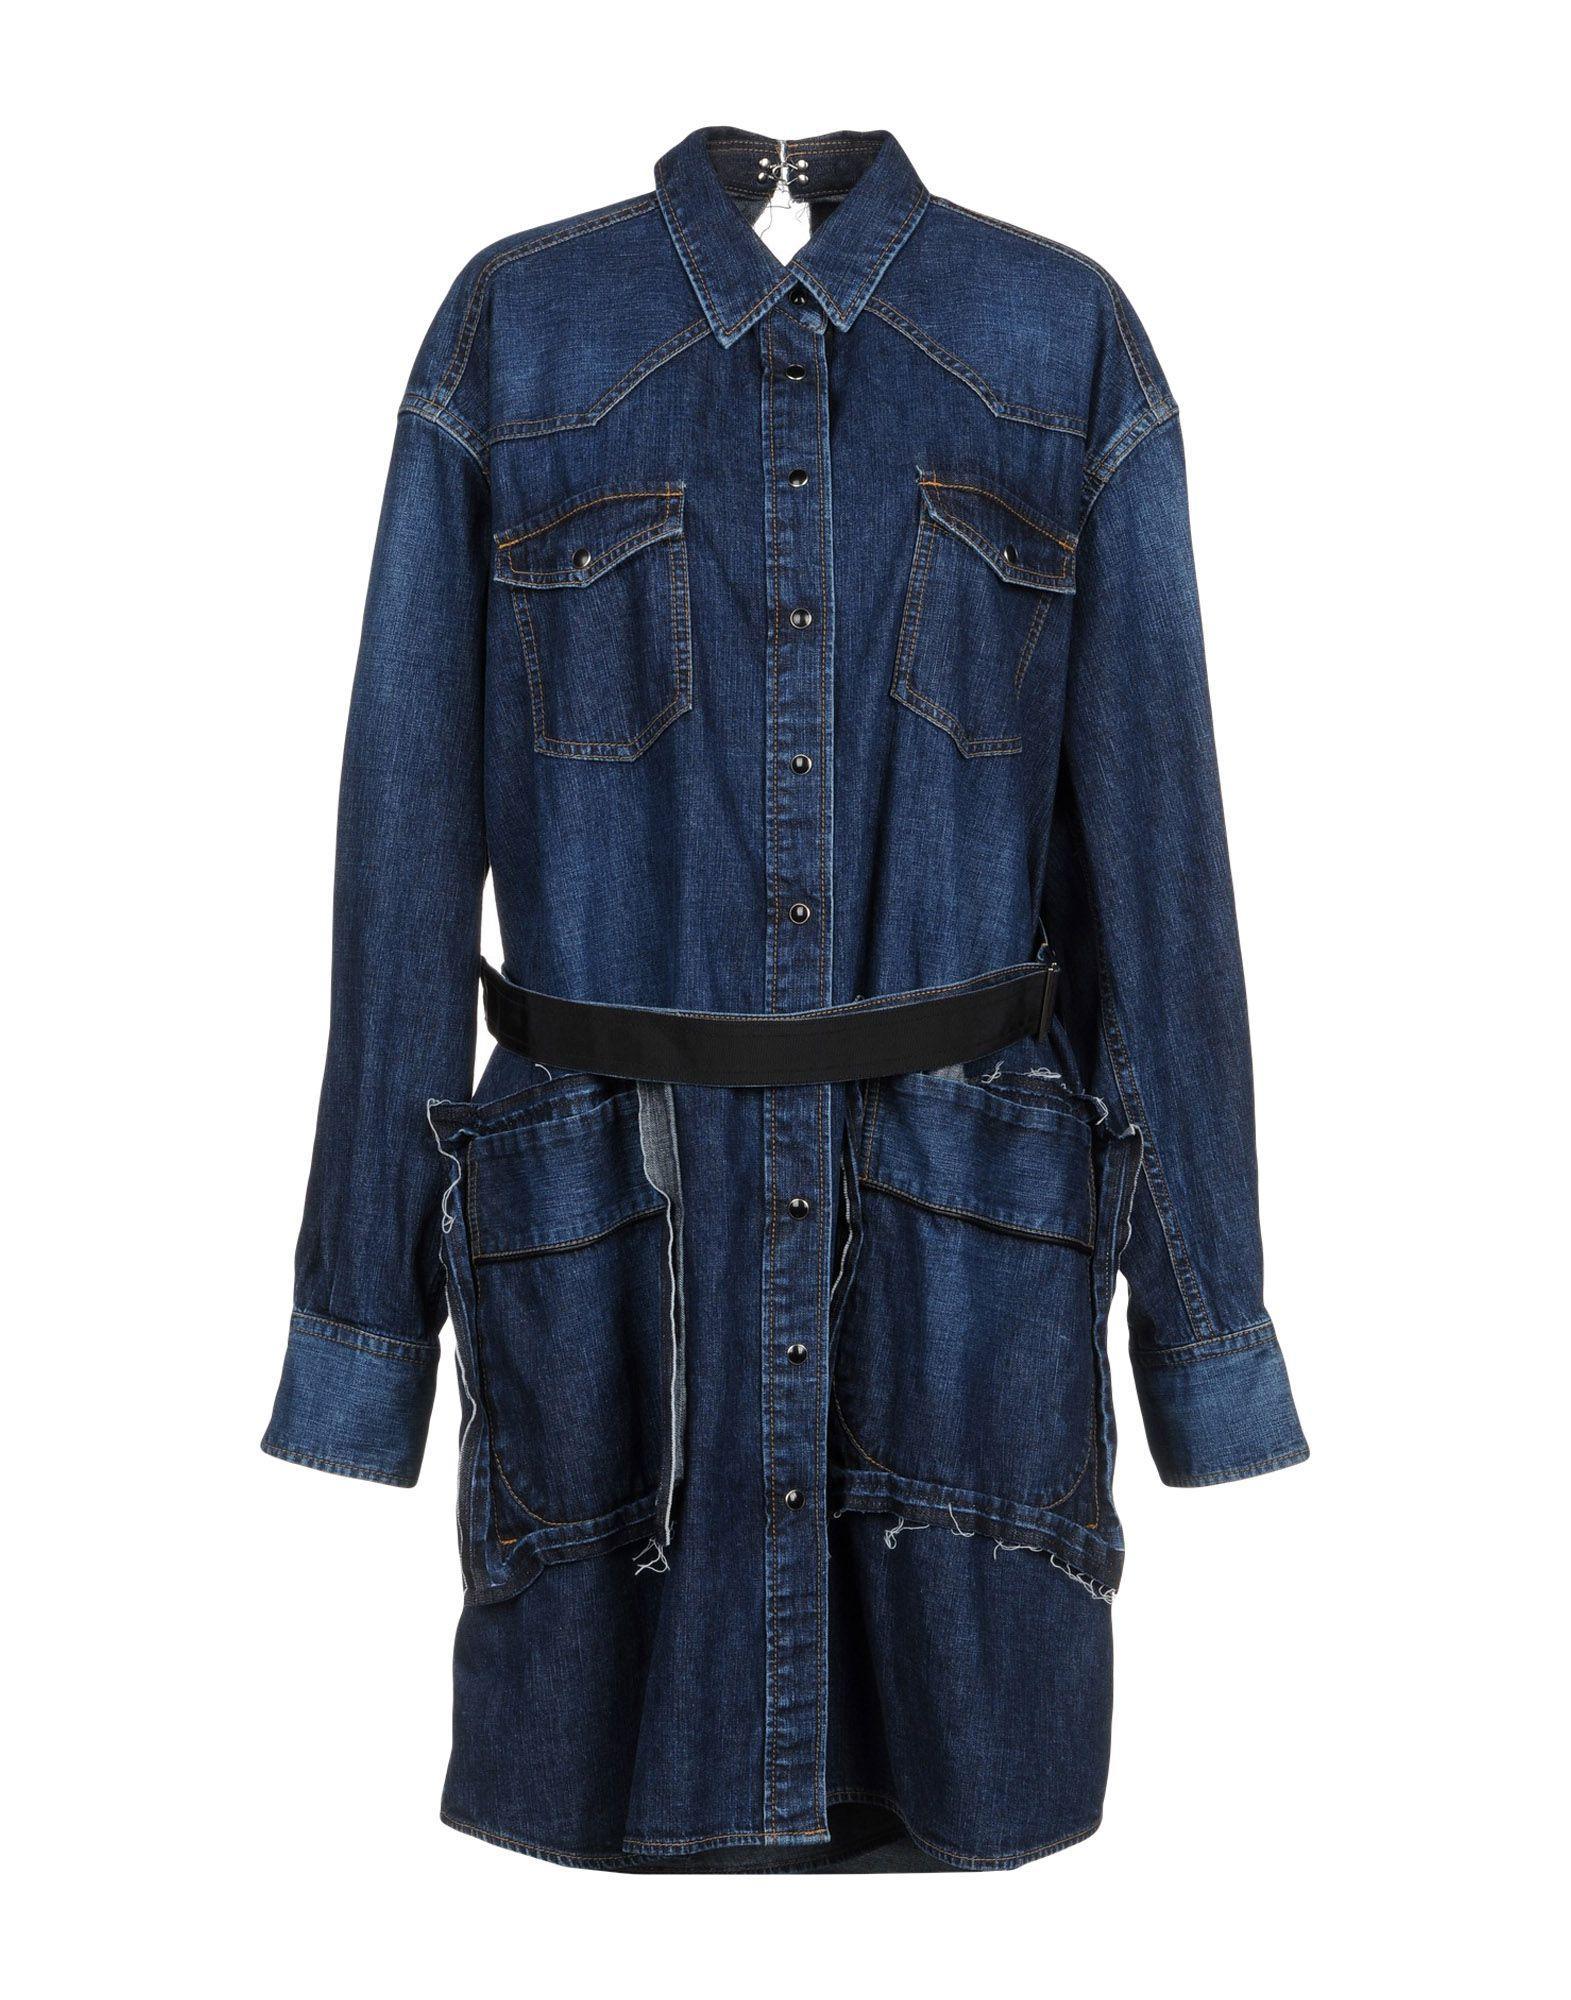 Sacai Denim Outerwear In Blue